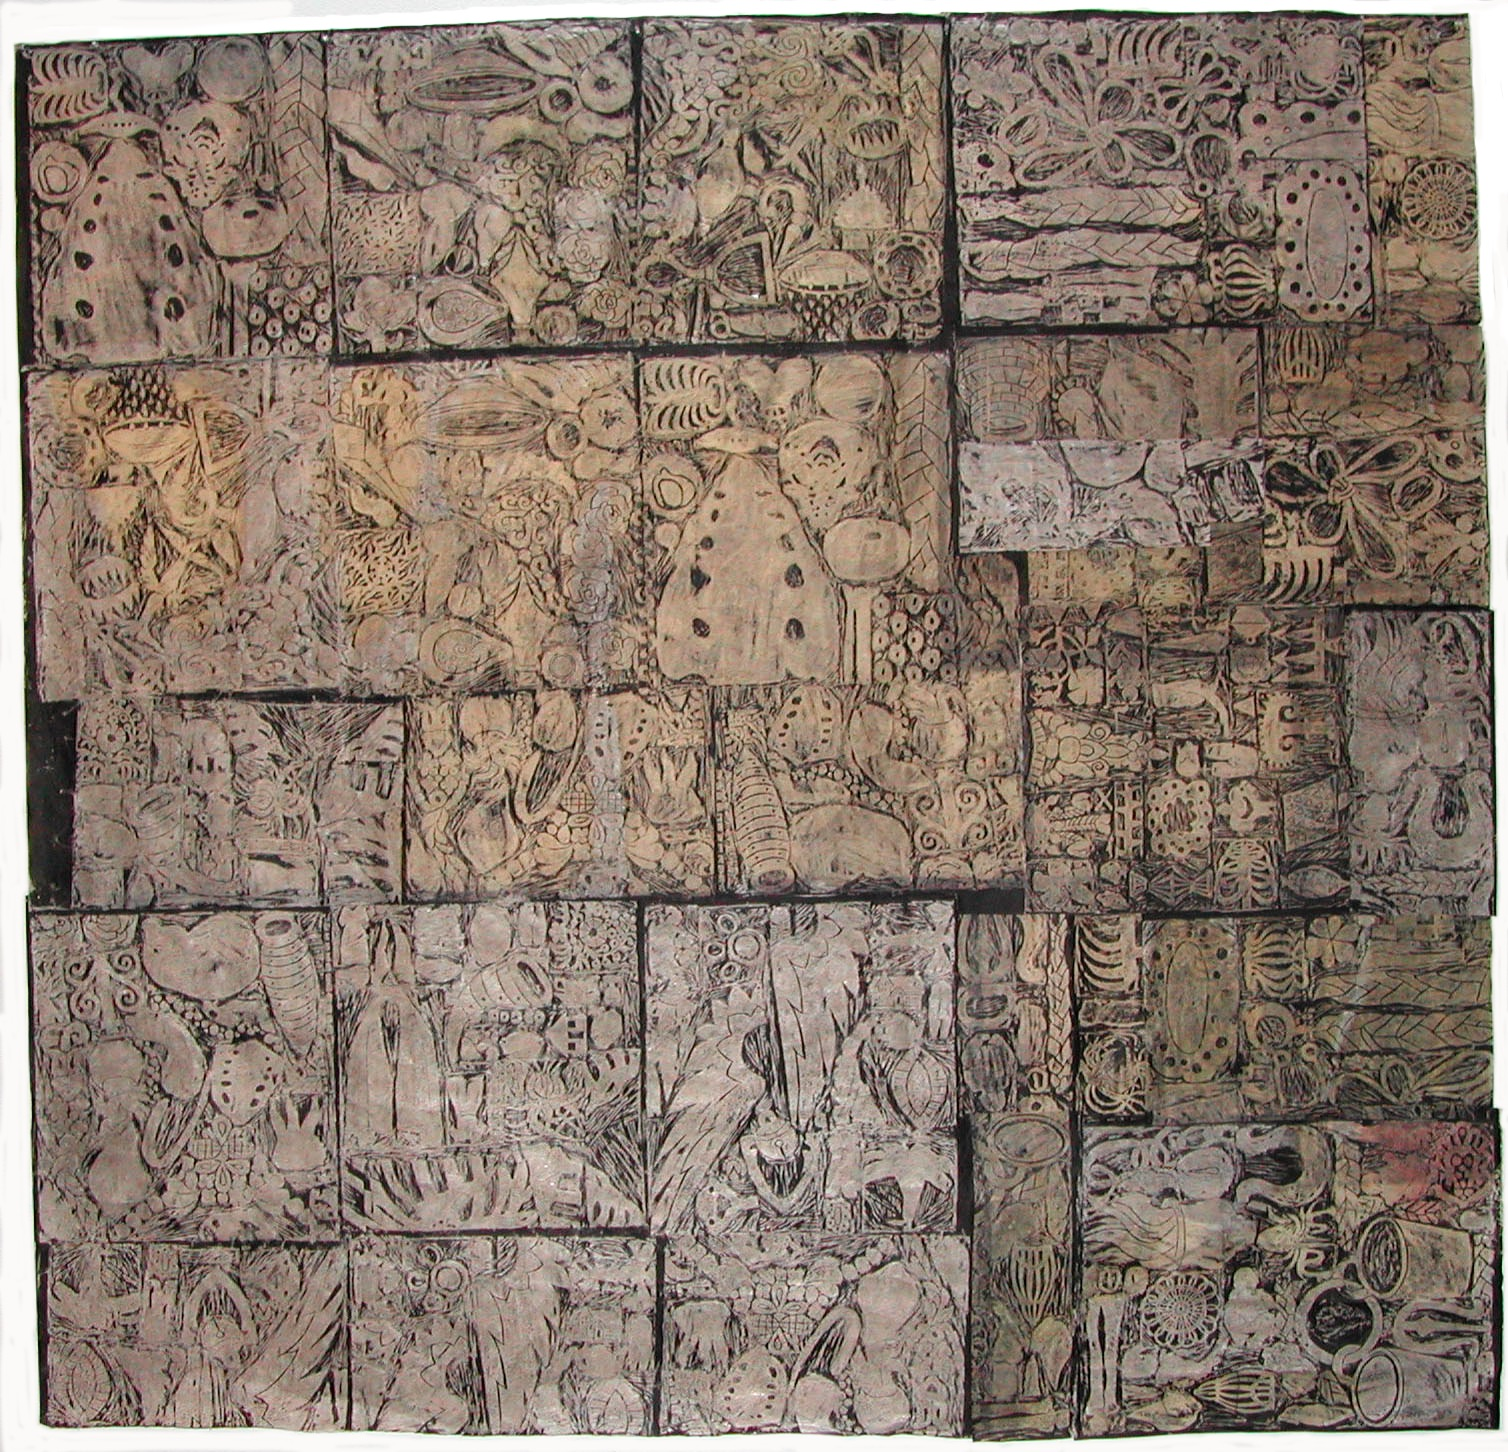 Imbue 9' x 9' wax, sumi ink, paste, Orkawara paper